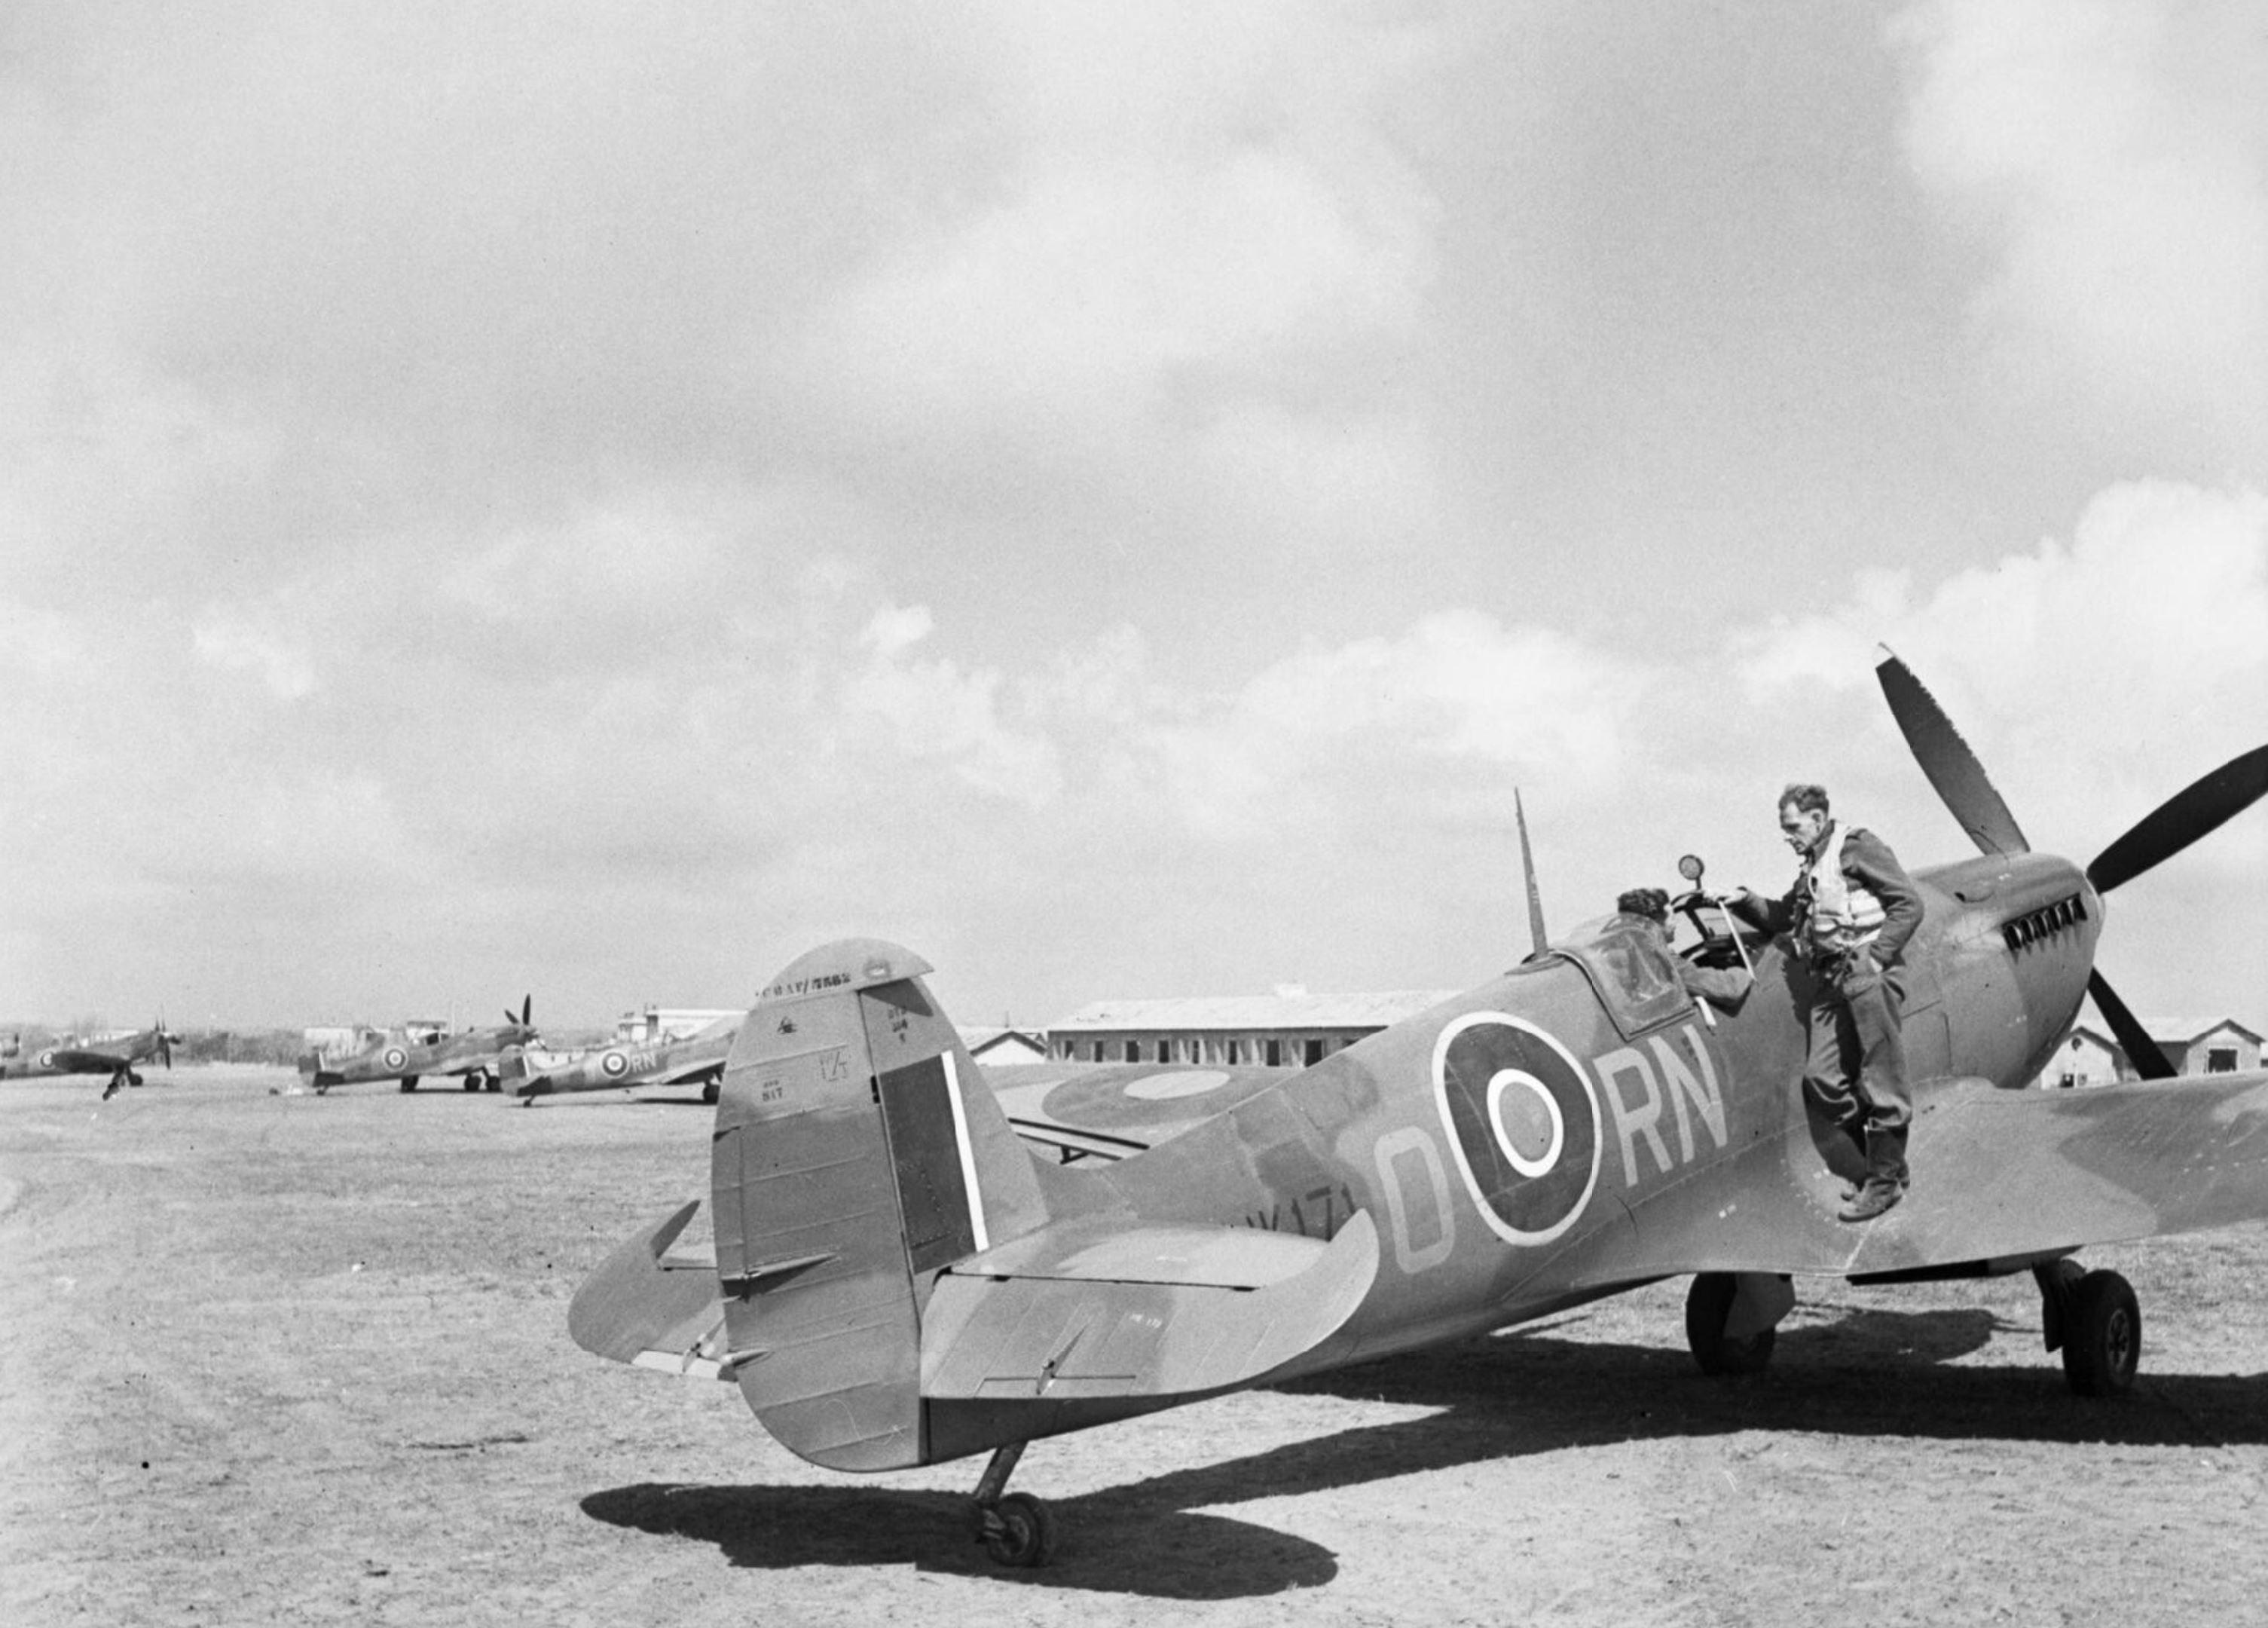 Spitfire MkVc RAF 72Sqn RNO JK171 taking off at Anzio Italy IWM NA14065a